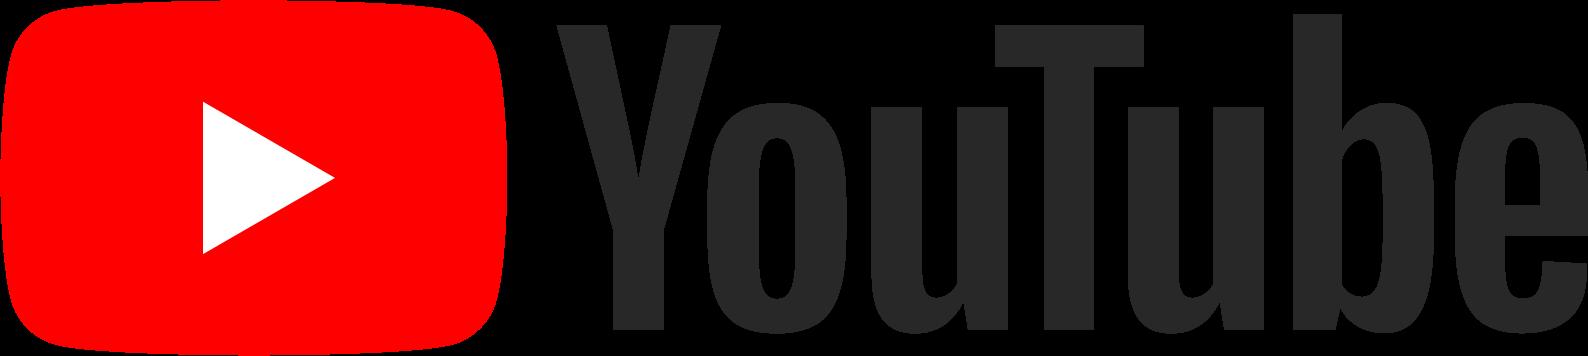 https://www.youtube.com/channel/UC9rXizyeNEotVvCFTfzHv-Q